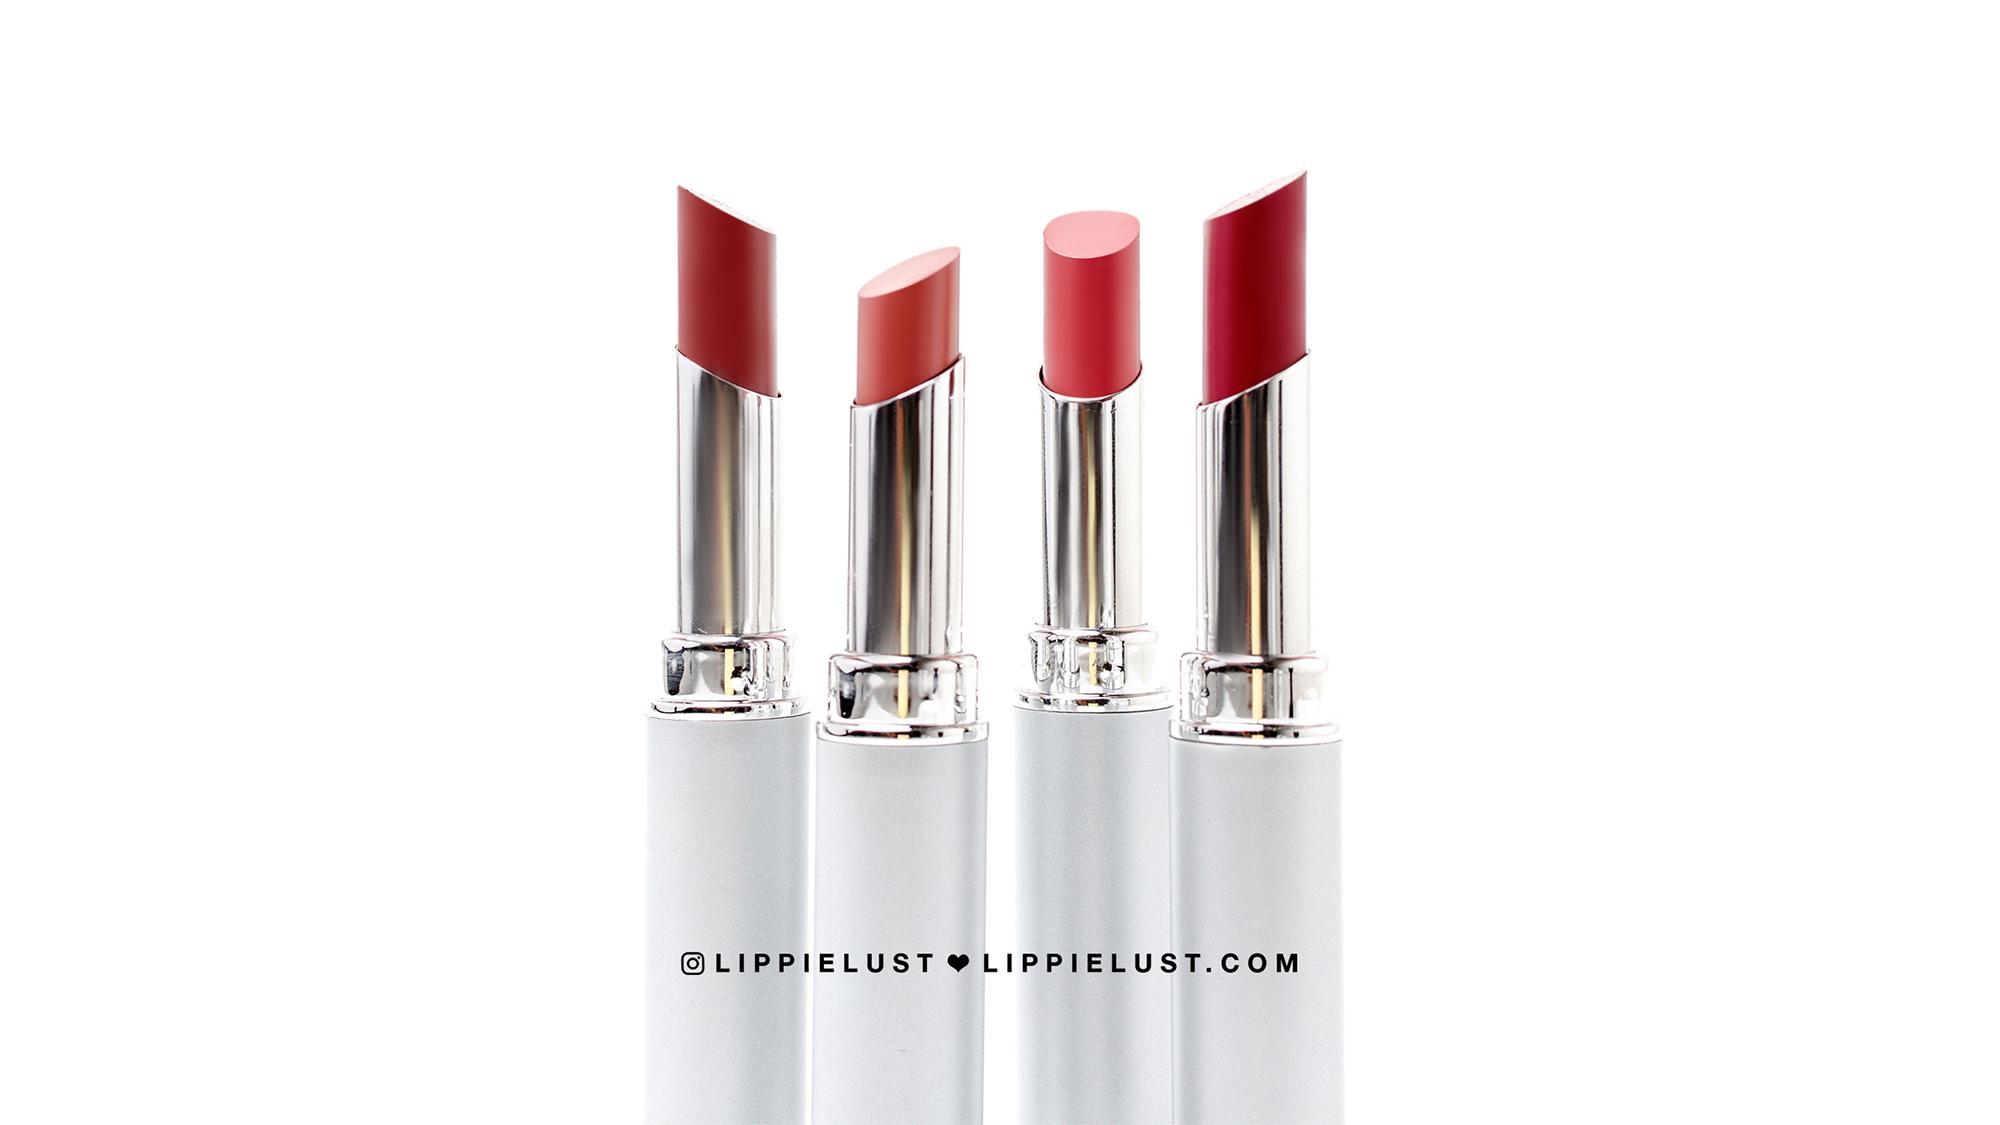 Swatch Review Wardah Cosmetics Intense Matte Lipstick All Shades